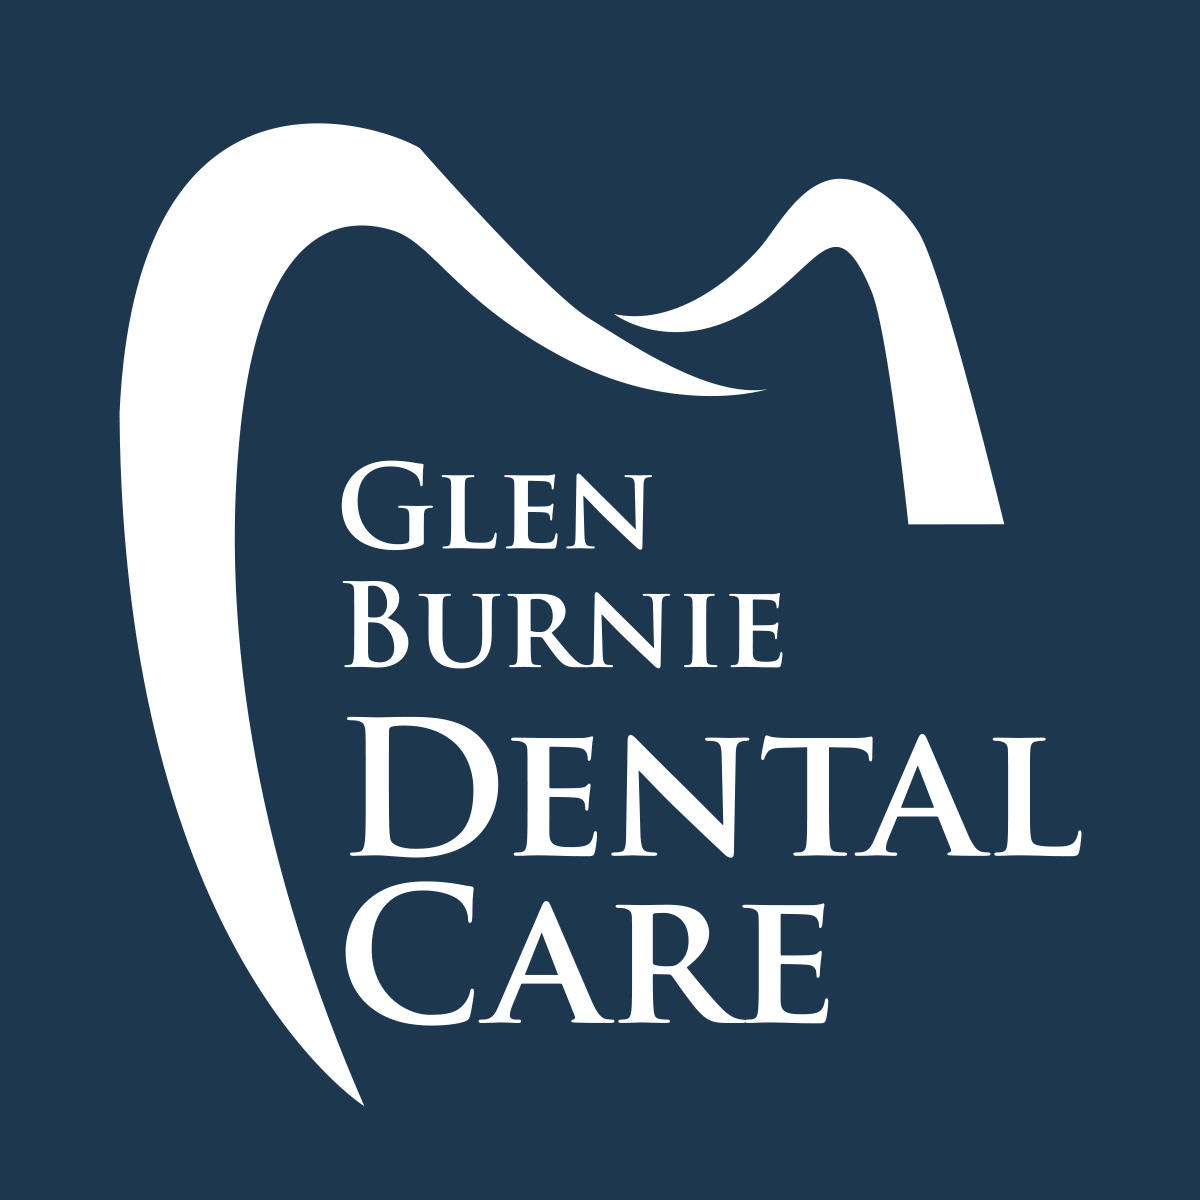 Glen Burnie Dental Care